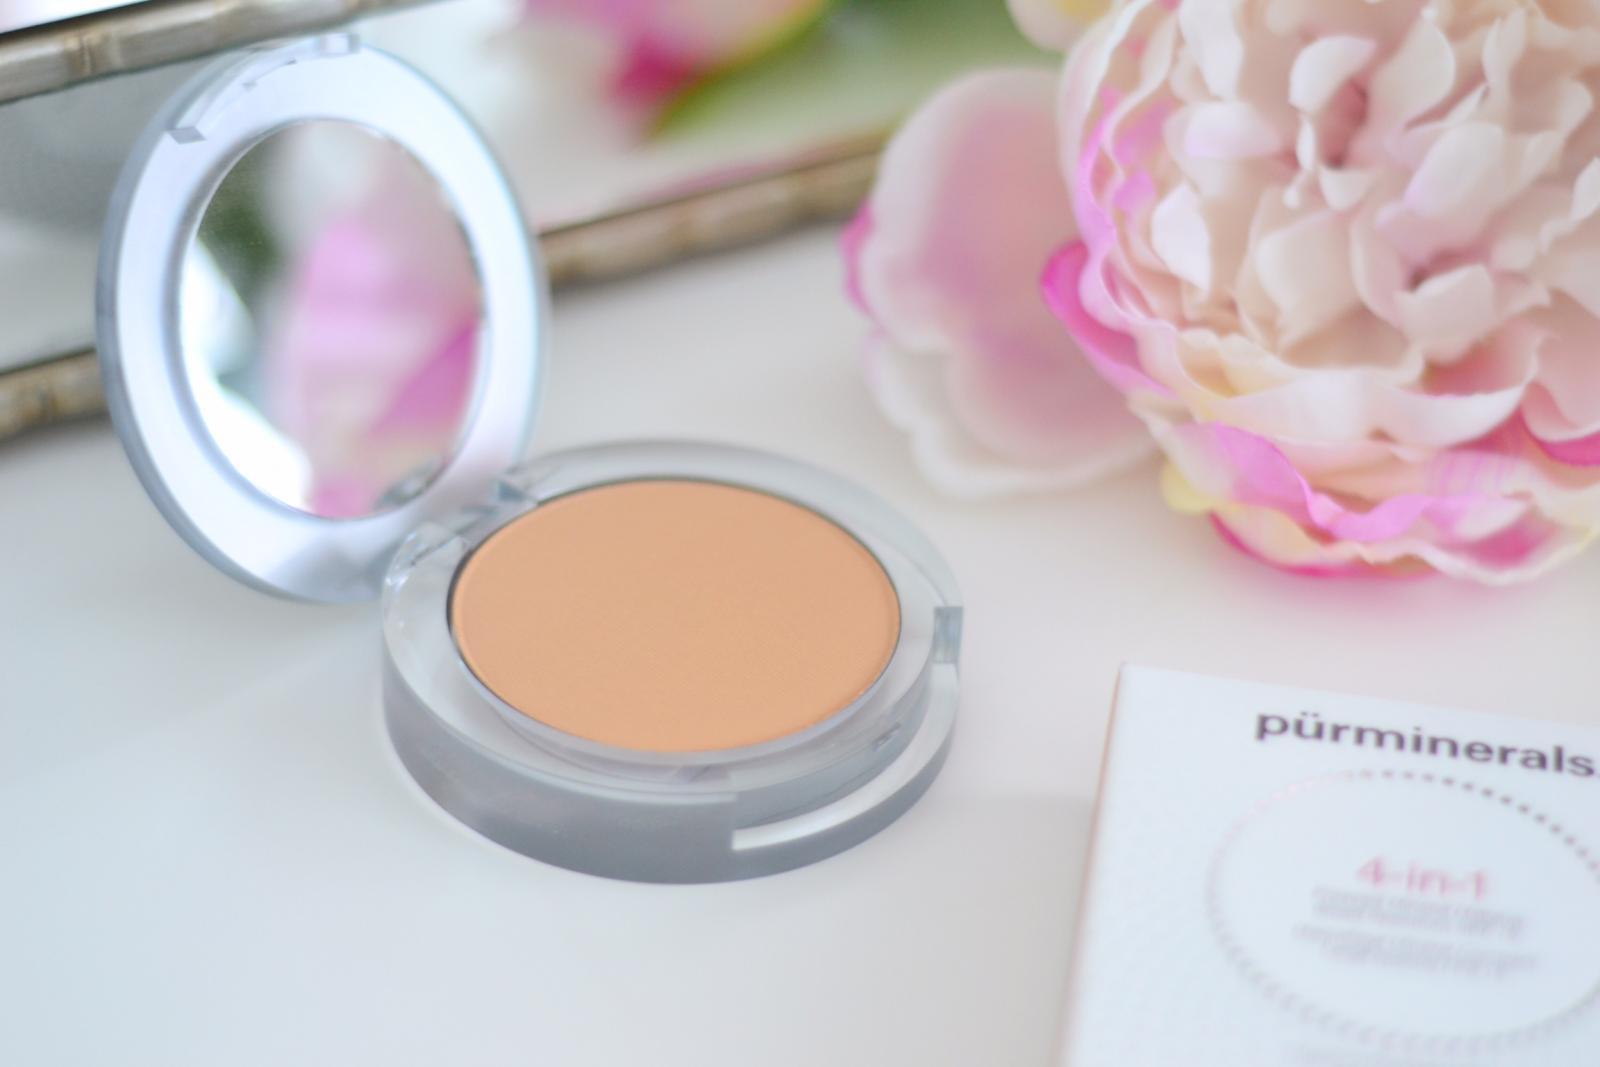 pur-mineral-makeup-pressed-powder